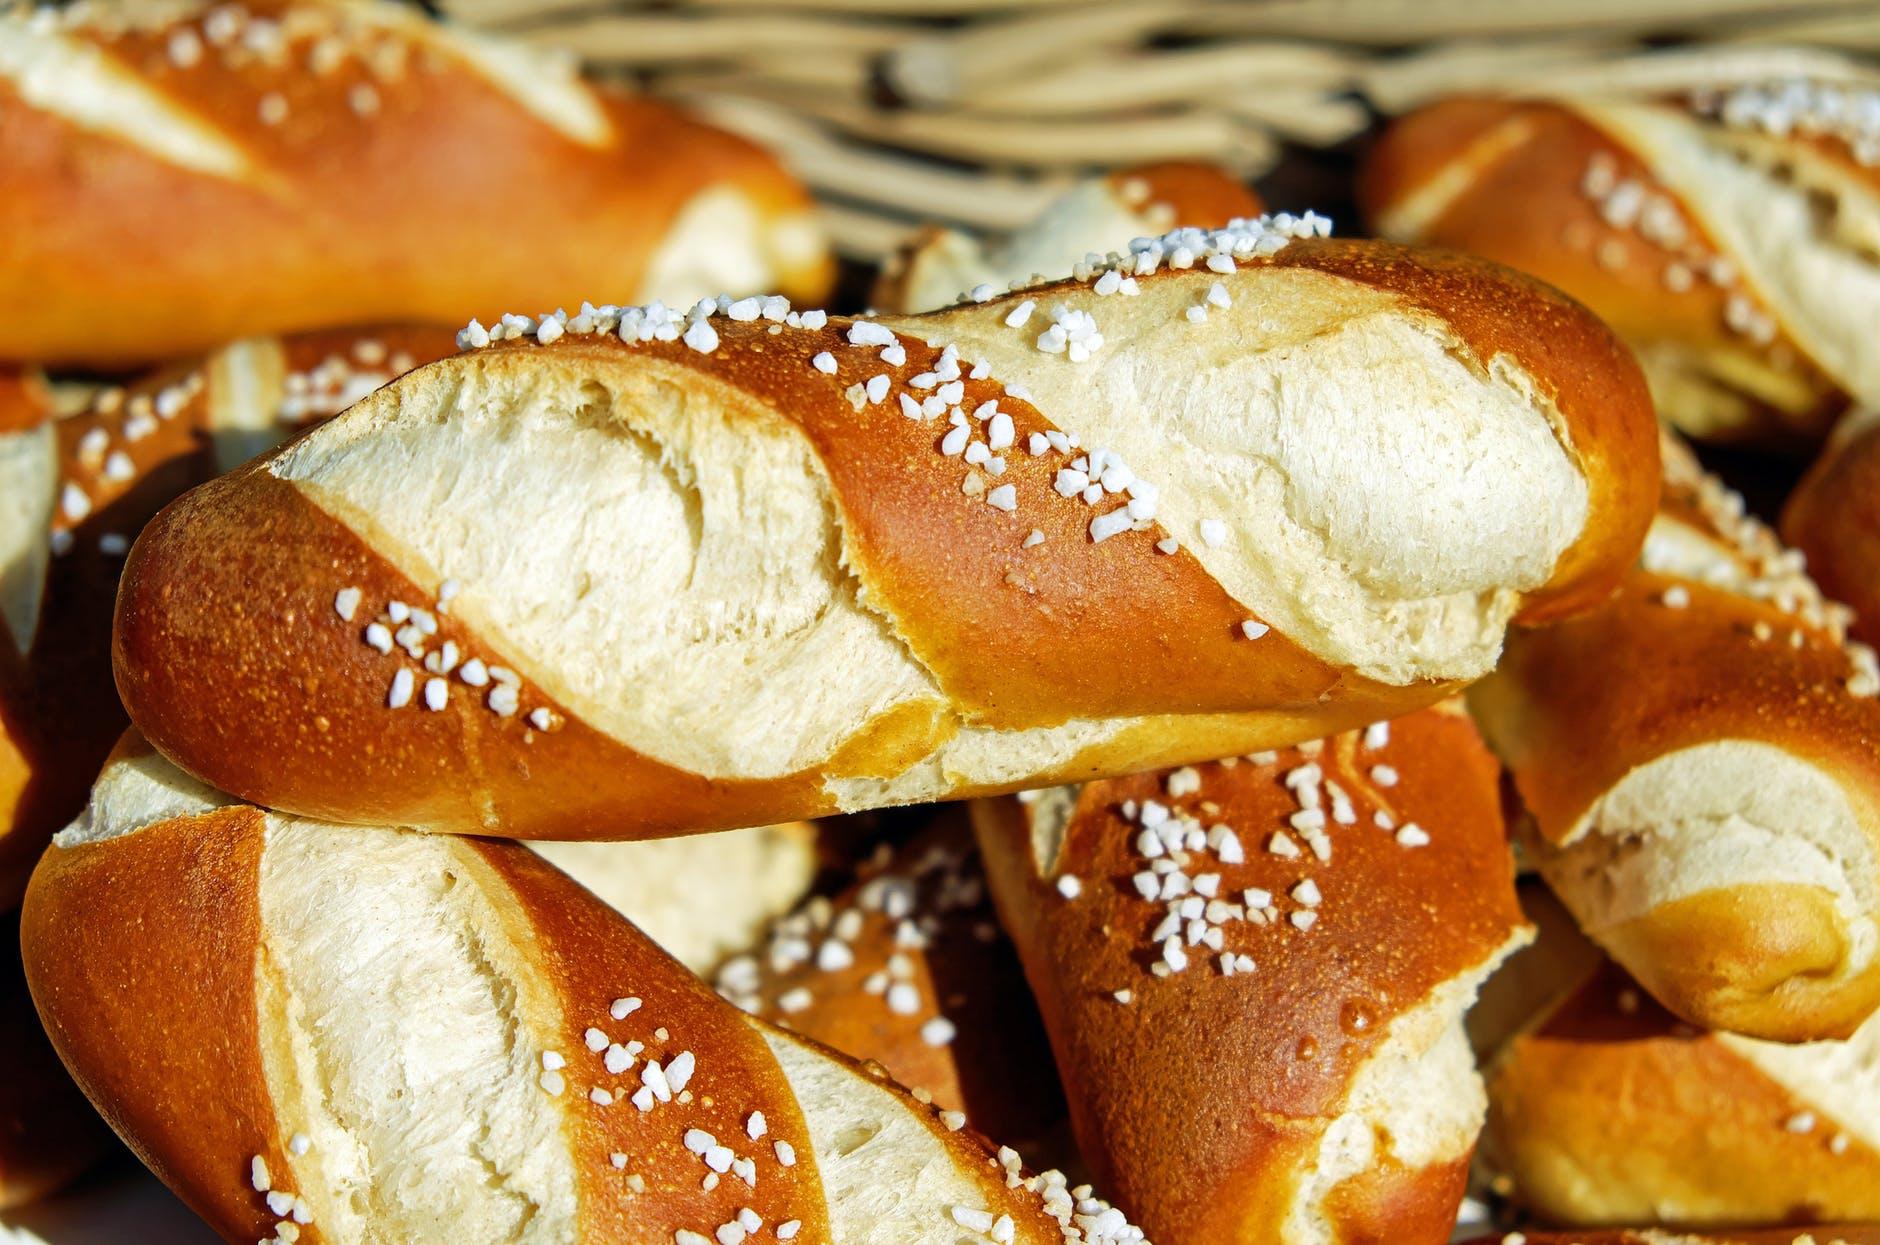 baked goods bakery bread breakfast